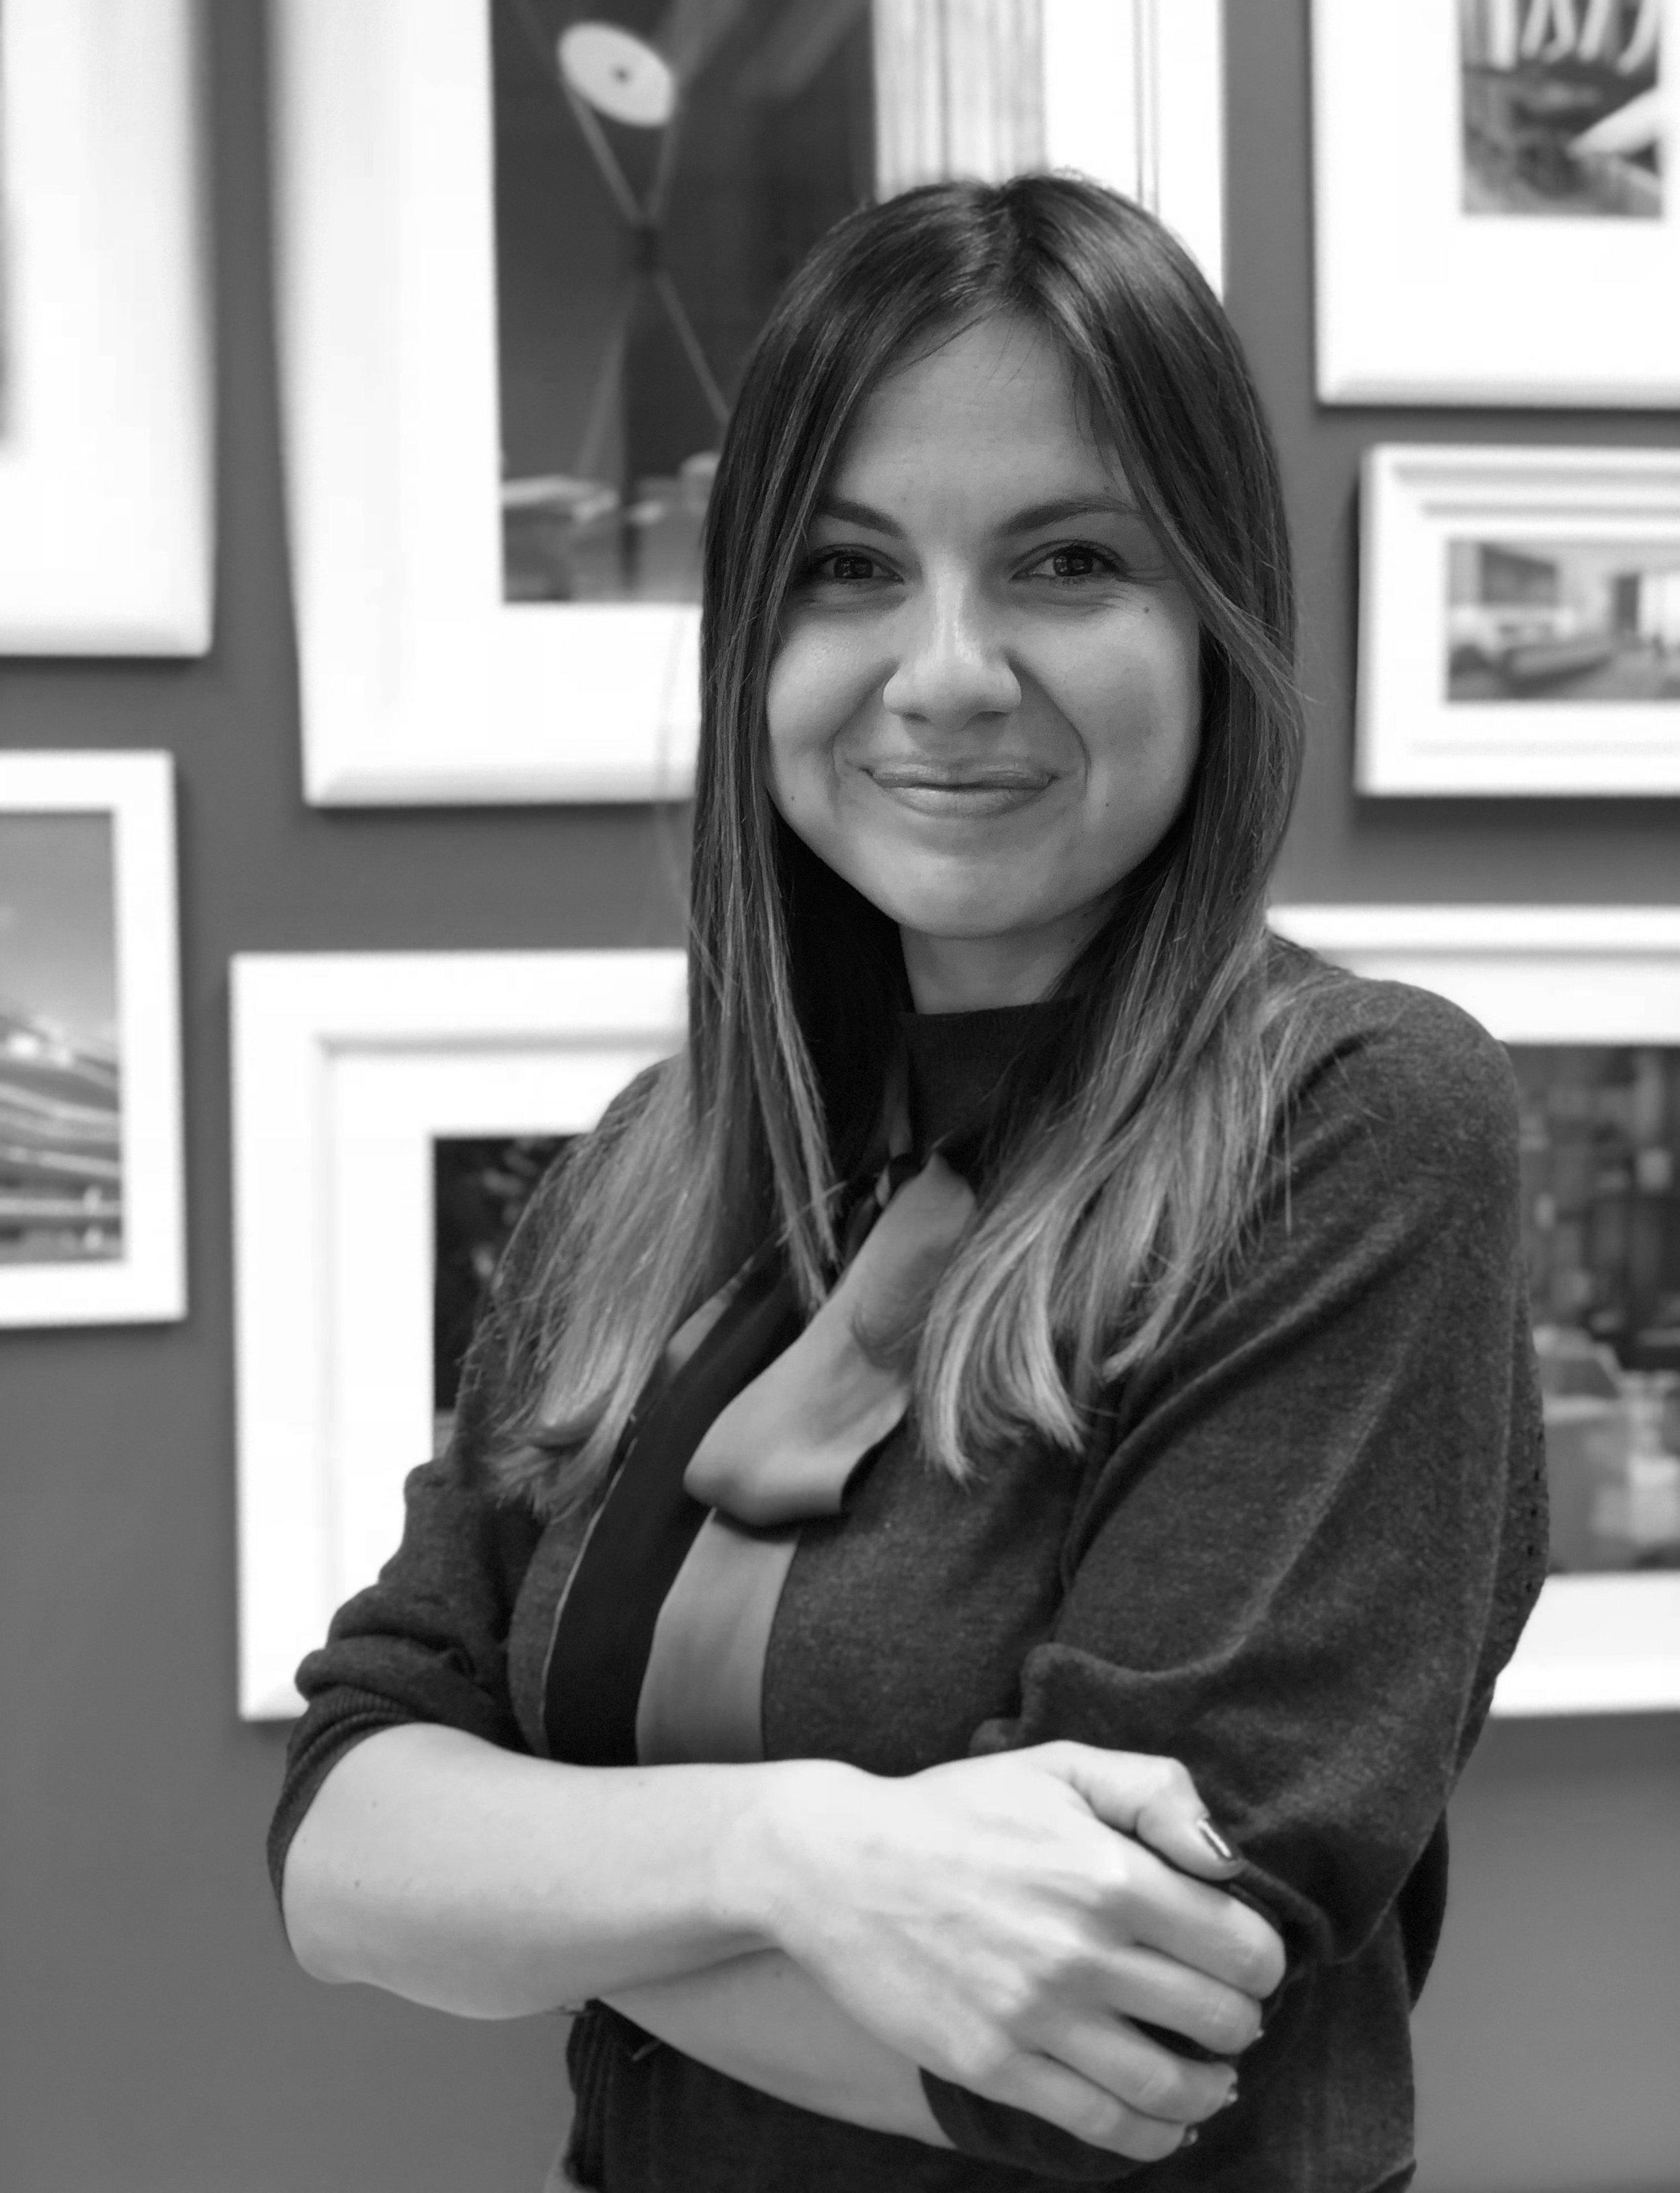 Lana Petrak, Senior Architect